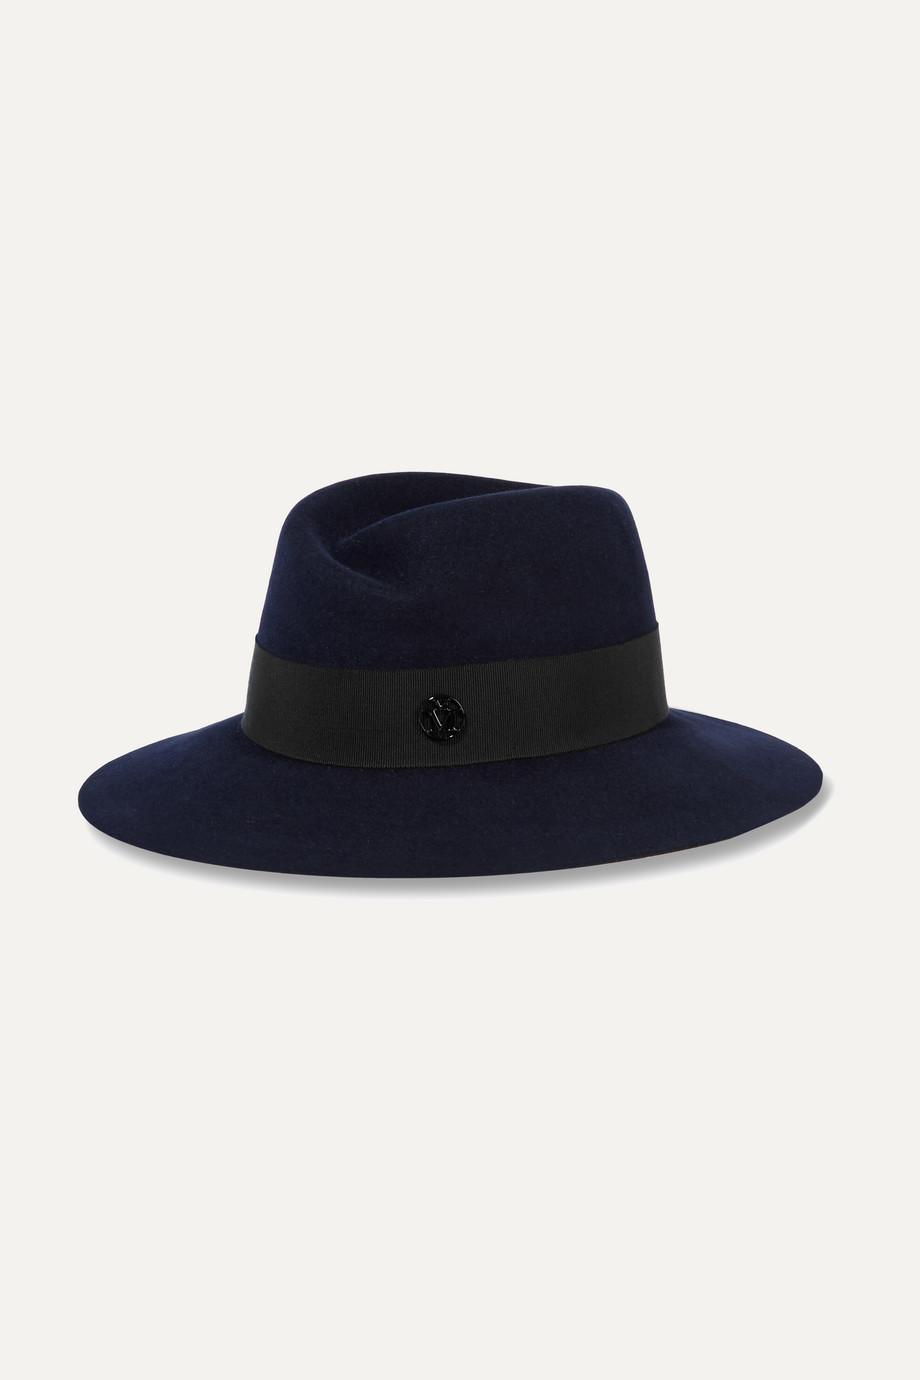 Maison Michel Virginie 兔毛毡浅顶卷檐帽